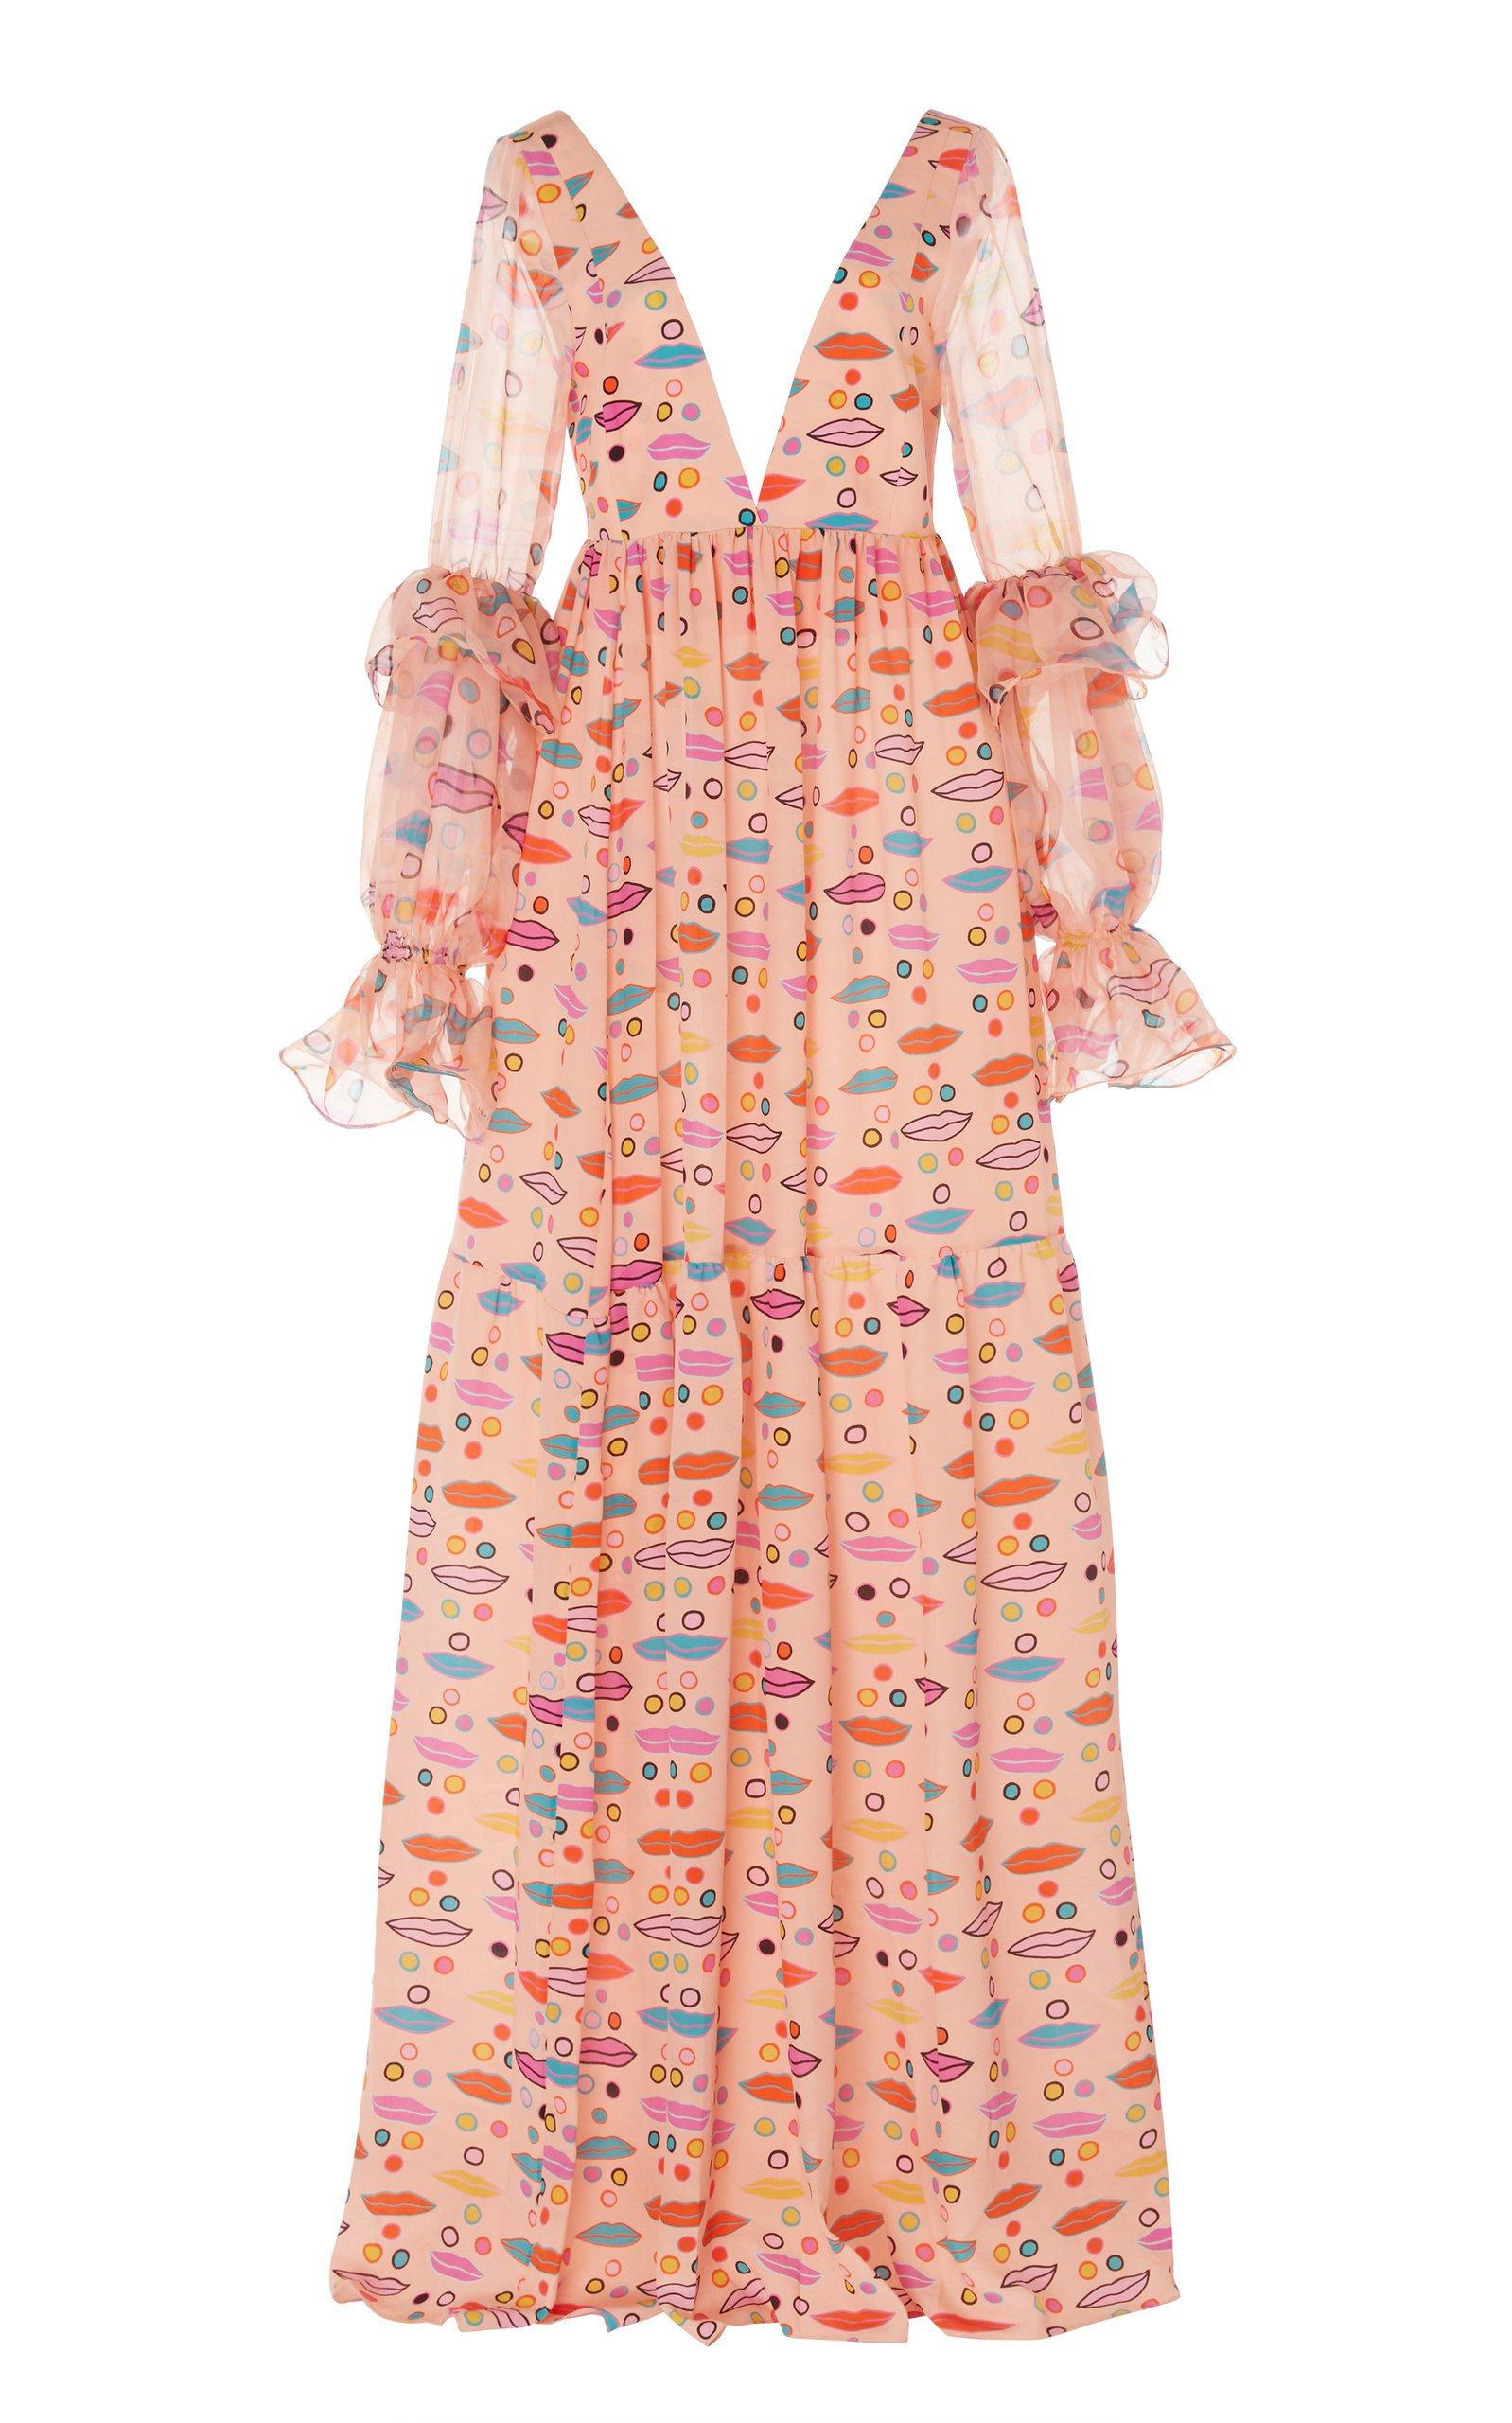 Leal Daccarett Lipari Crepe De Chine Dress Size: 8